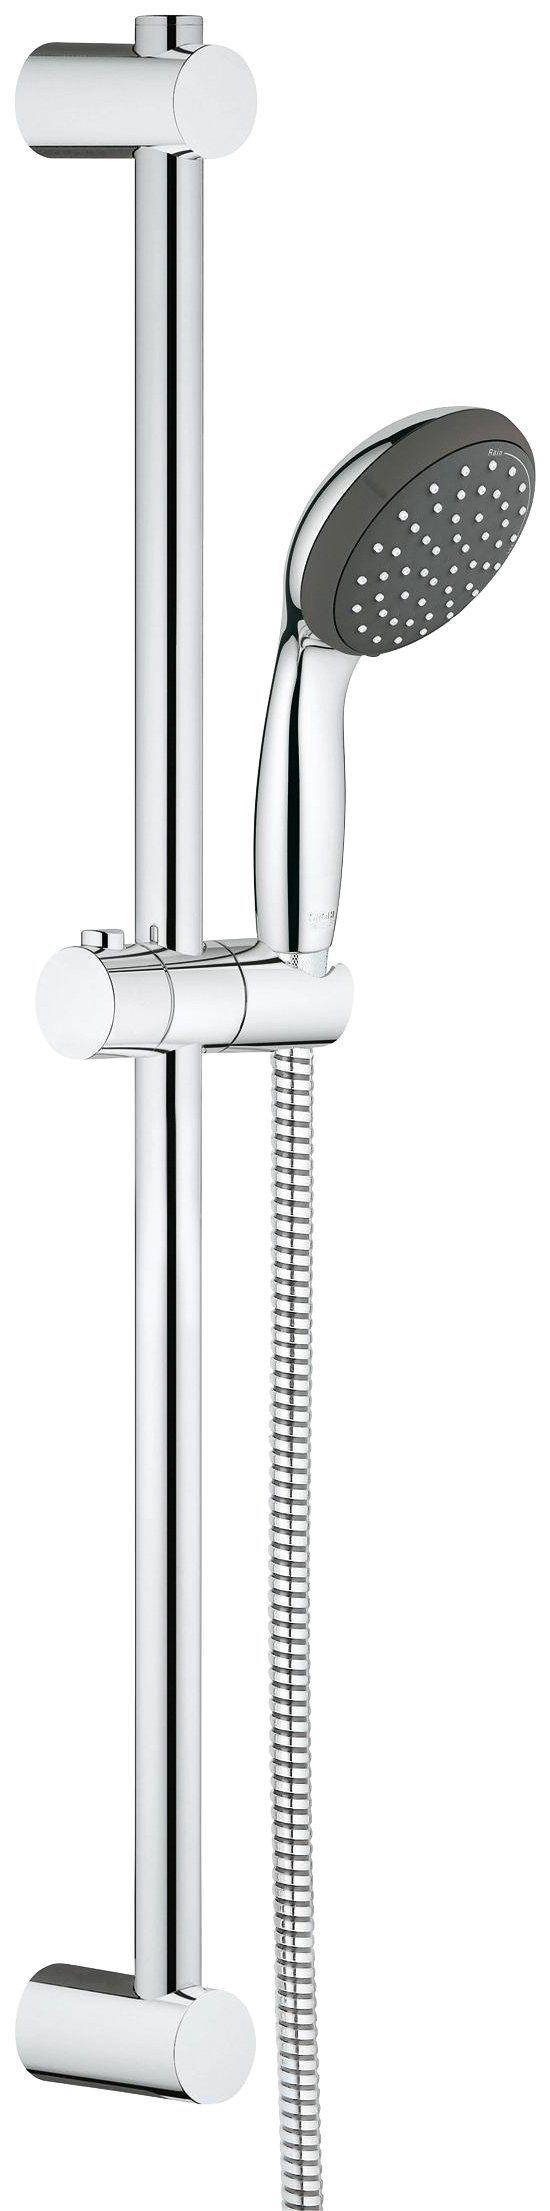 Grohe thermostat seite 1 preisvergleich for Grohe vitalio go 100